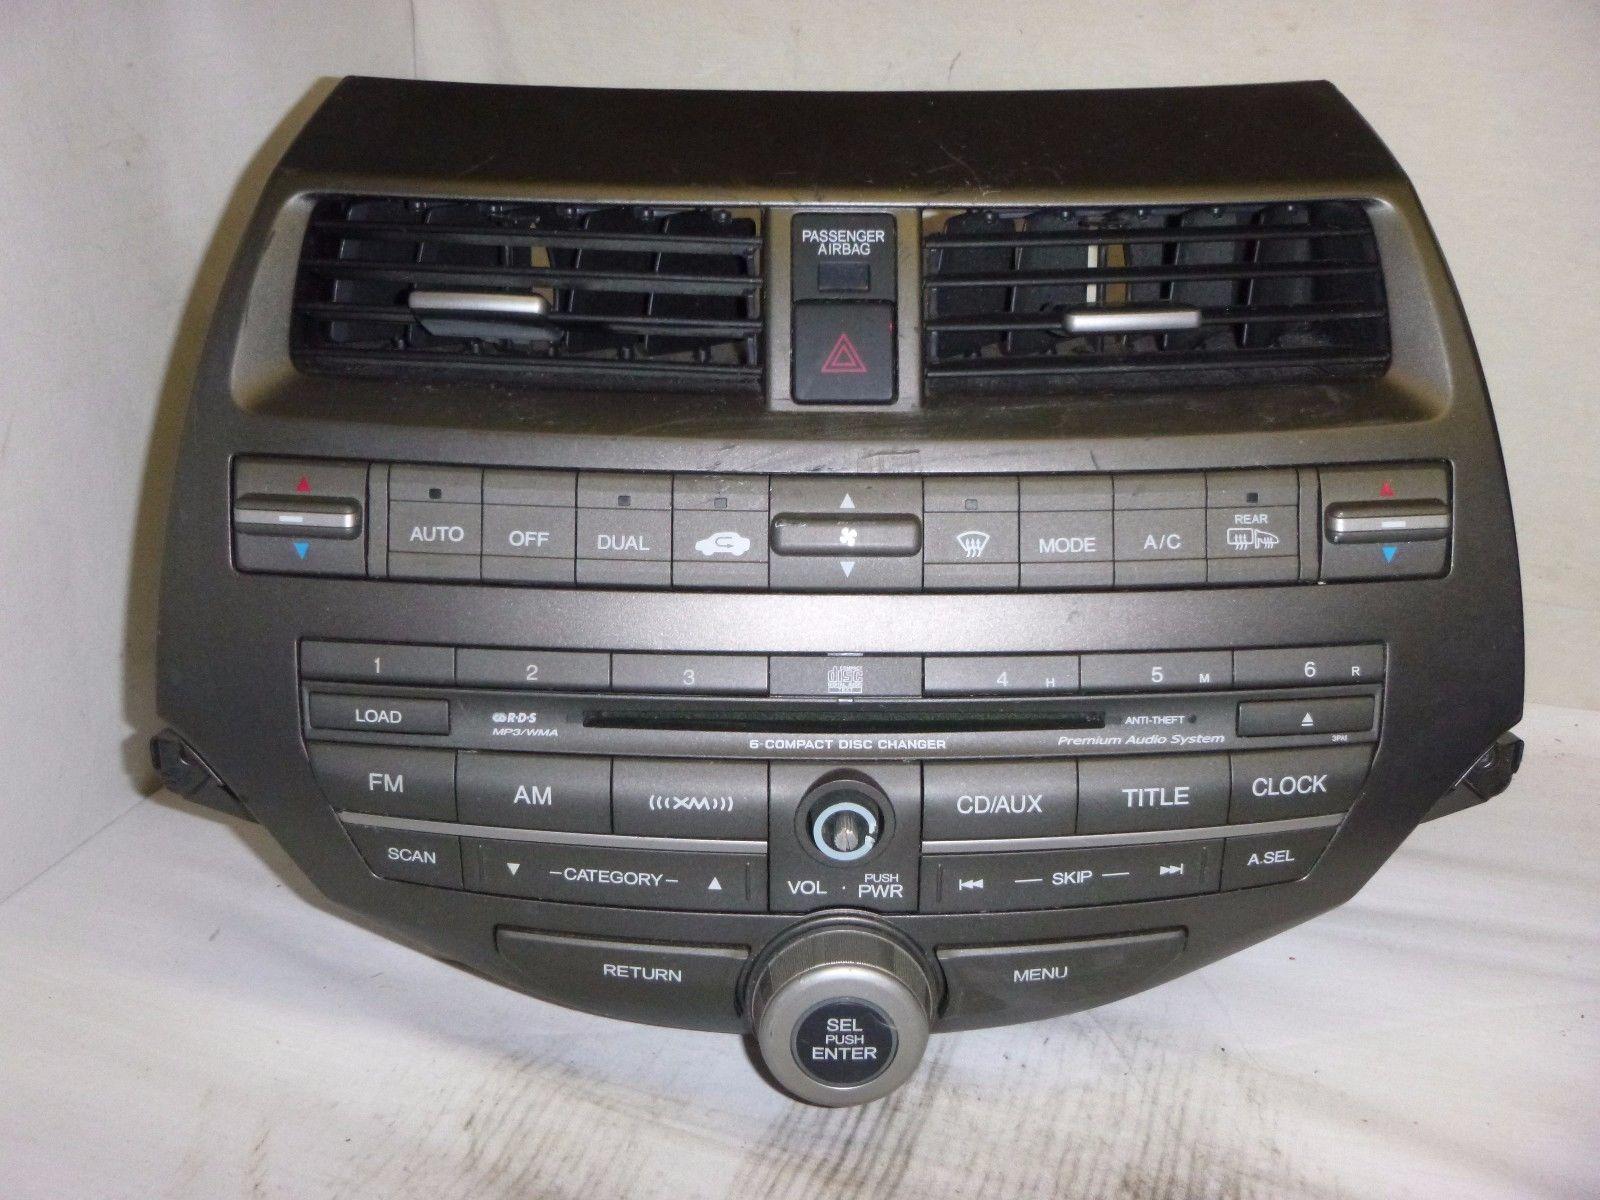 08 09 10 Honda Accord Premium Radio 6 Cd Mp3 & Code 39101-TA0-A620 3PA1 T9112